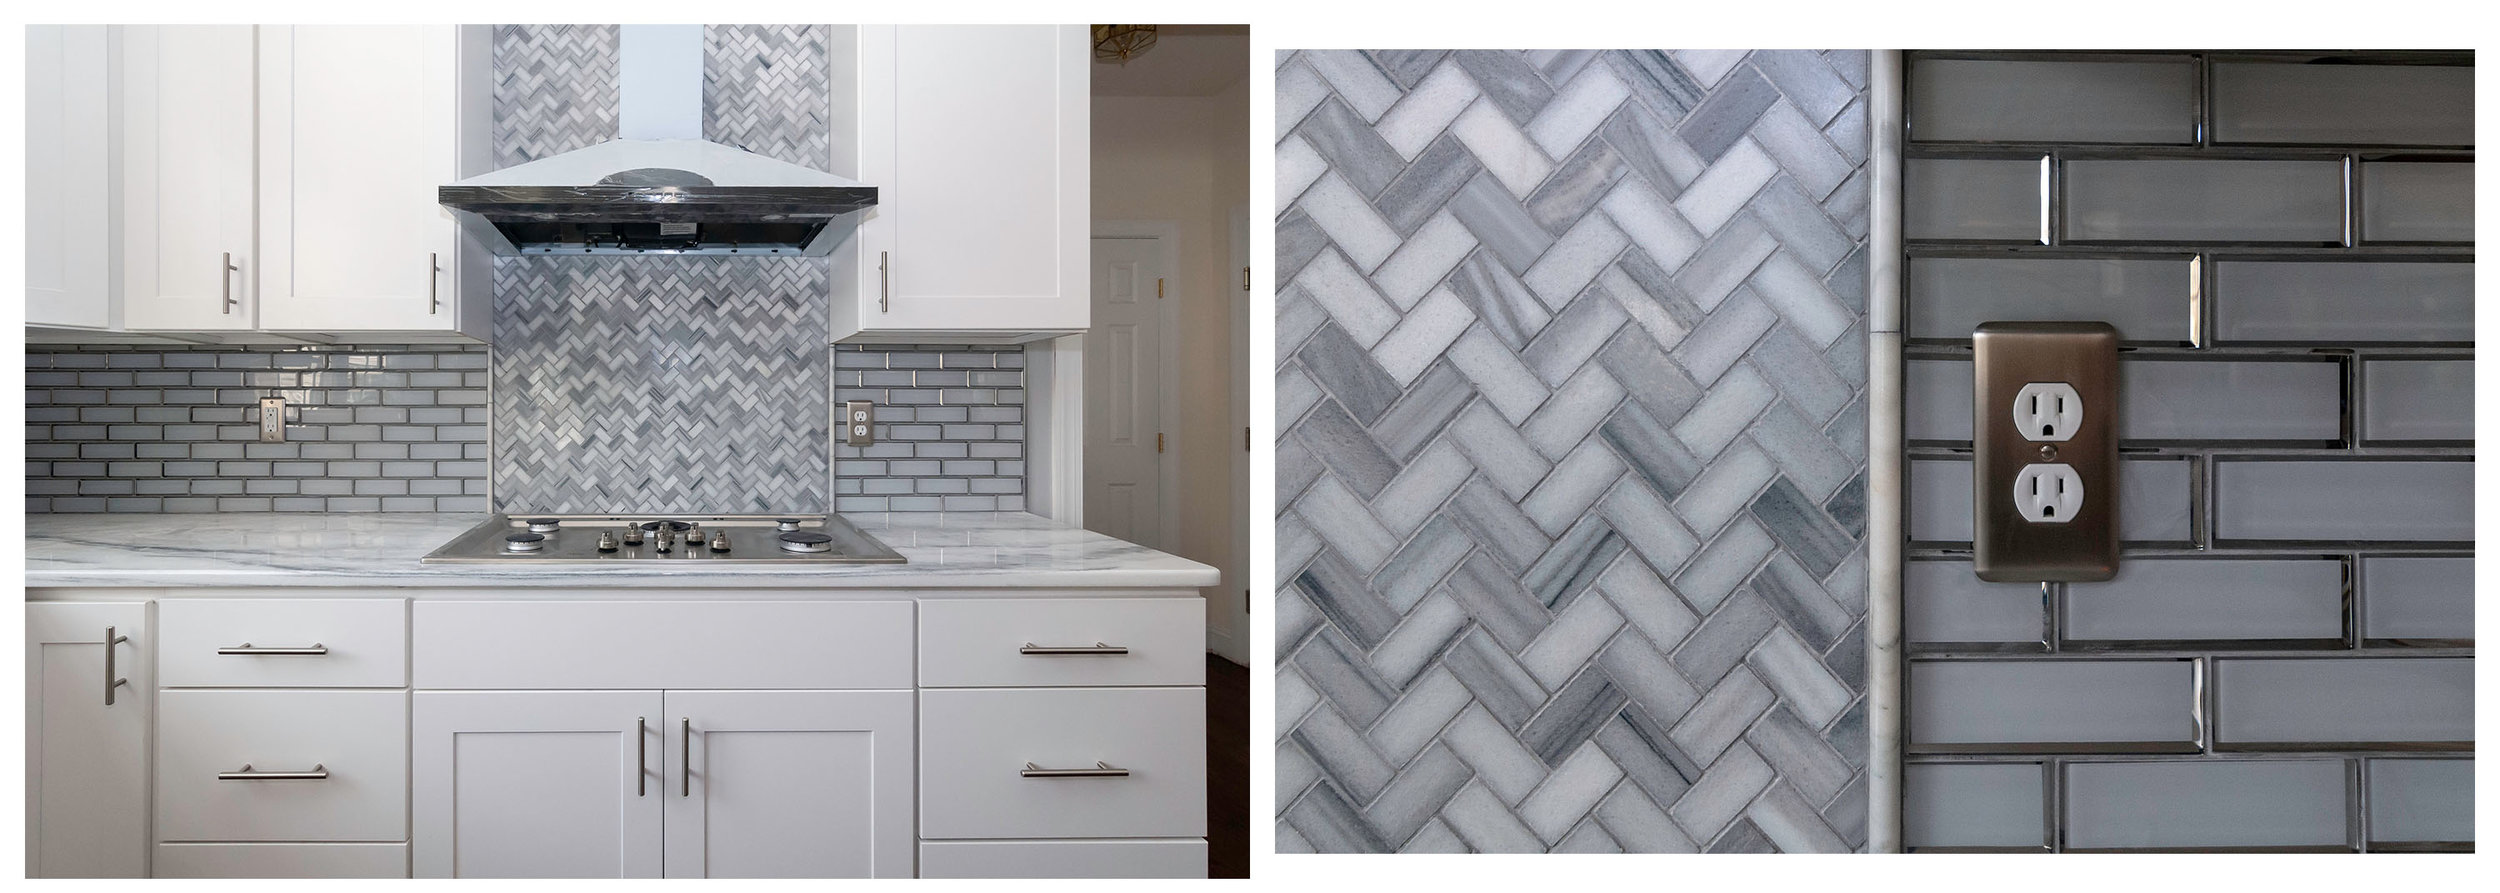 6 Harness Kitchen Tile Comparison.jpg